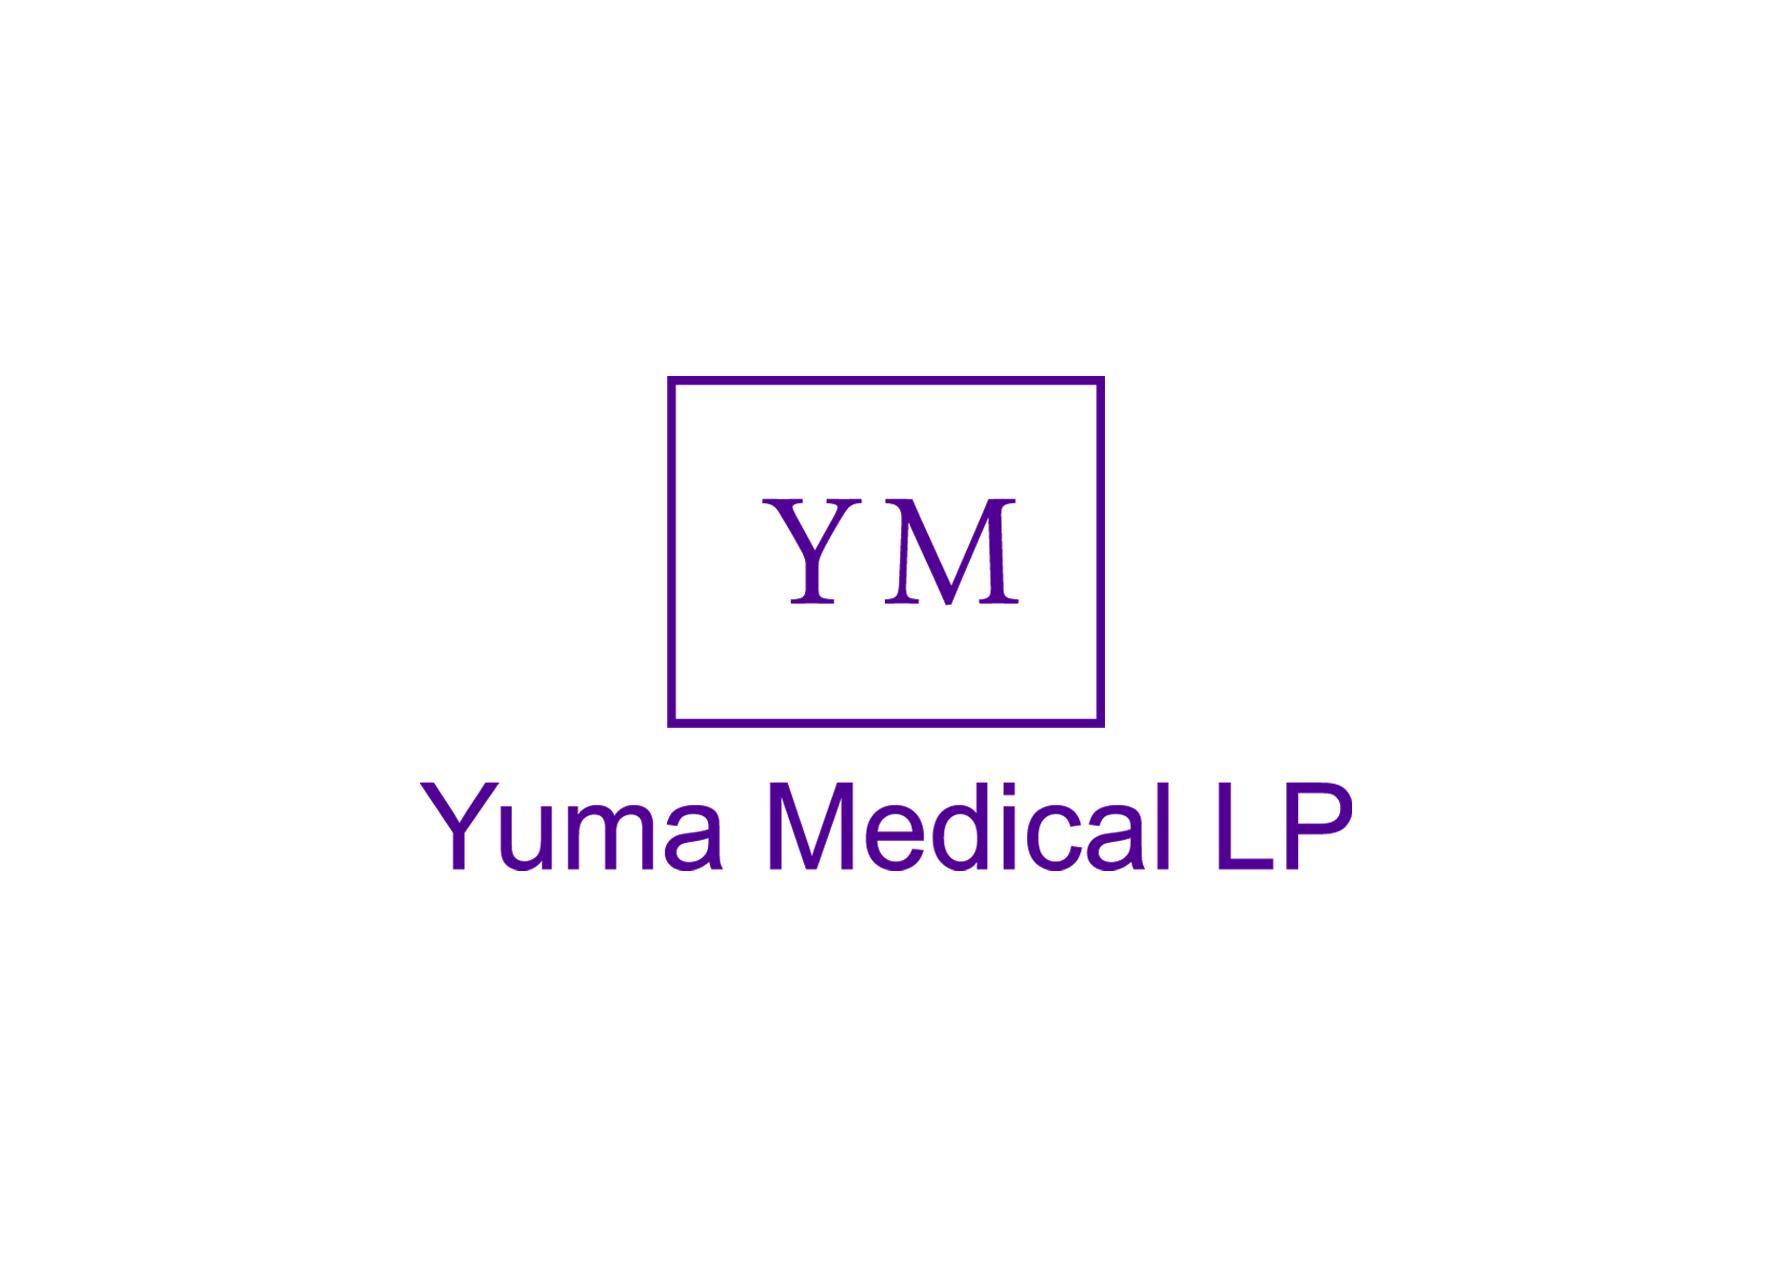 YUMA MEDICAL LP